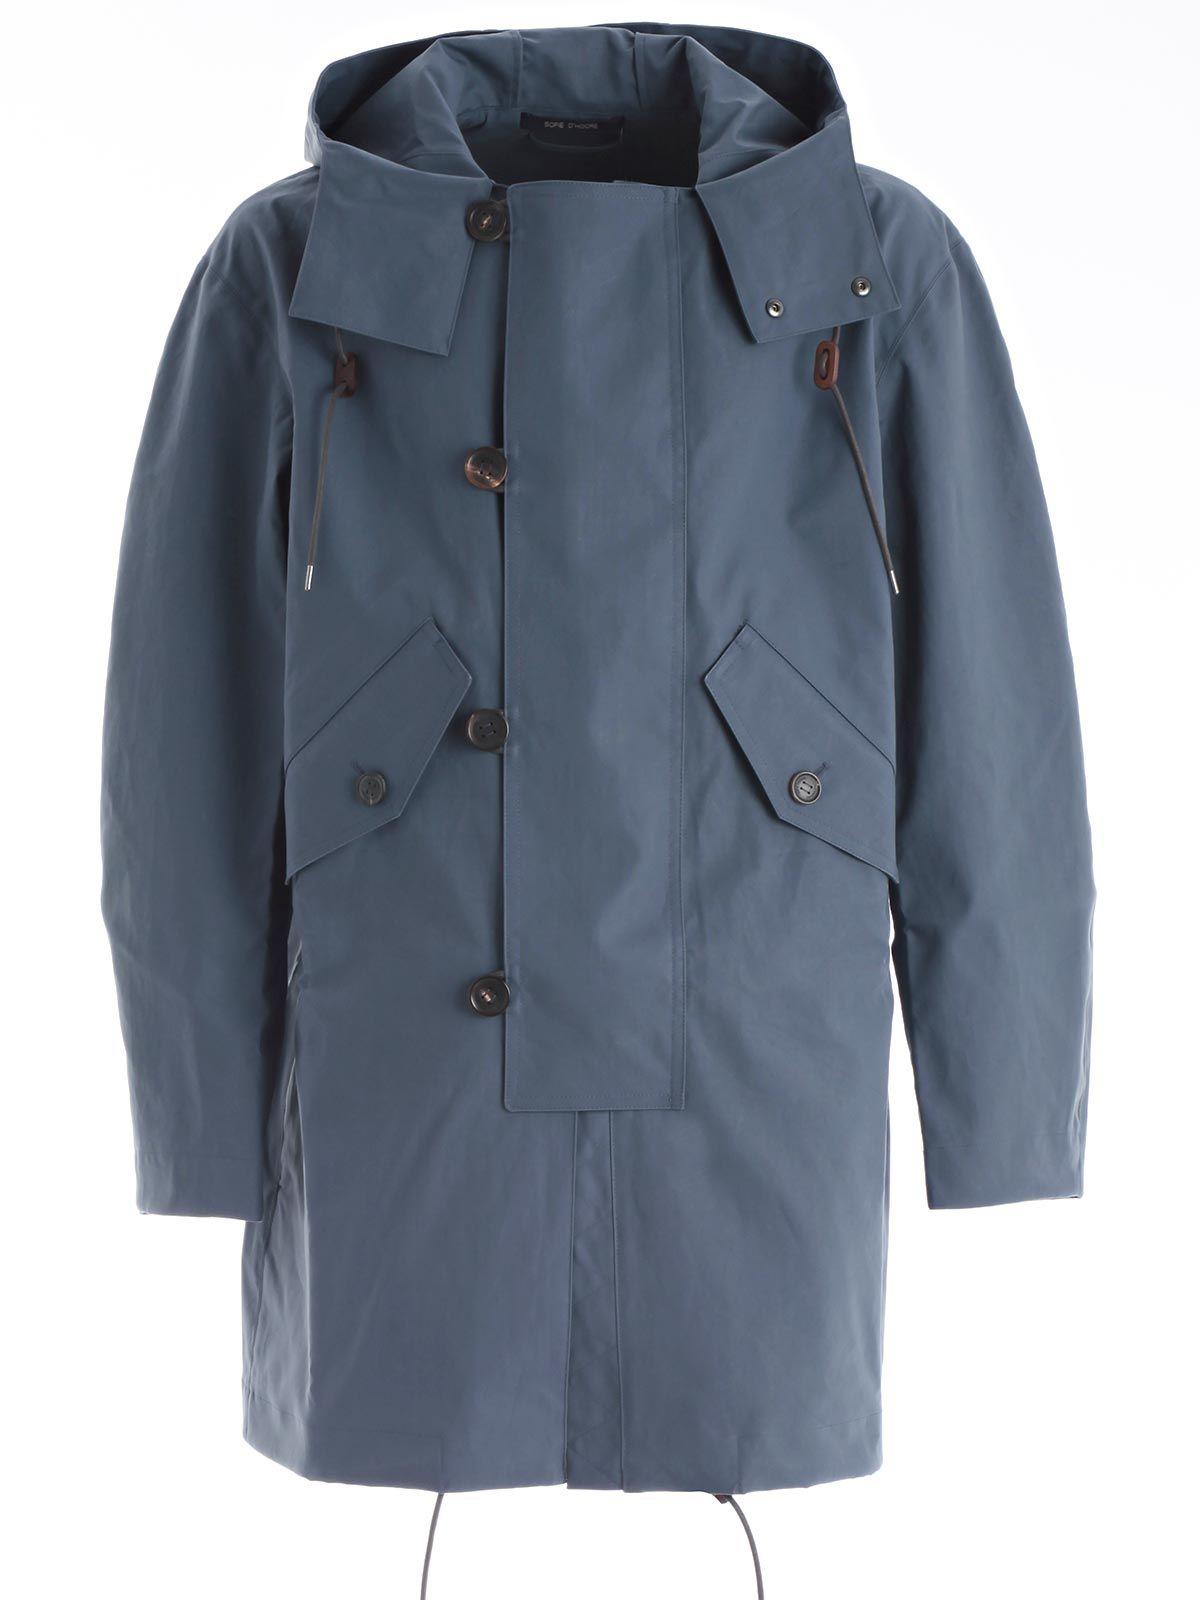 Sofie dHoore Coat